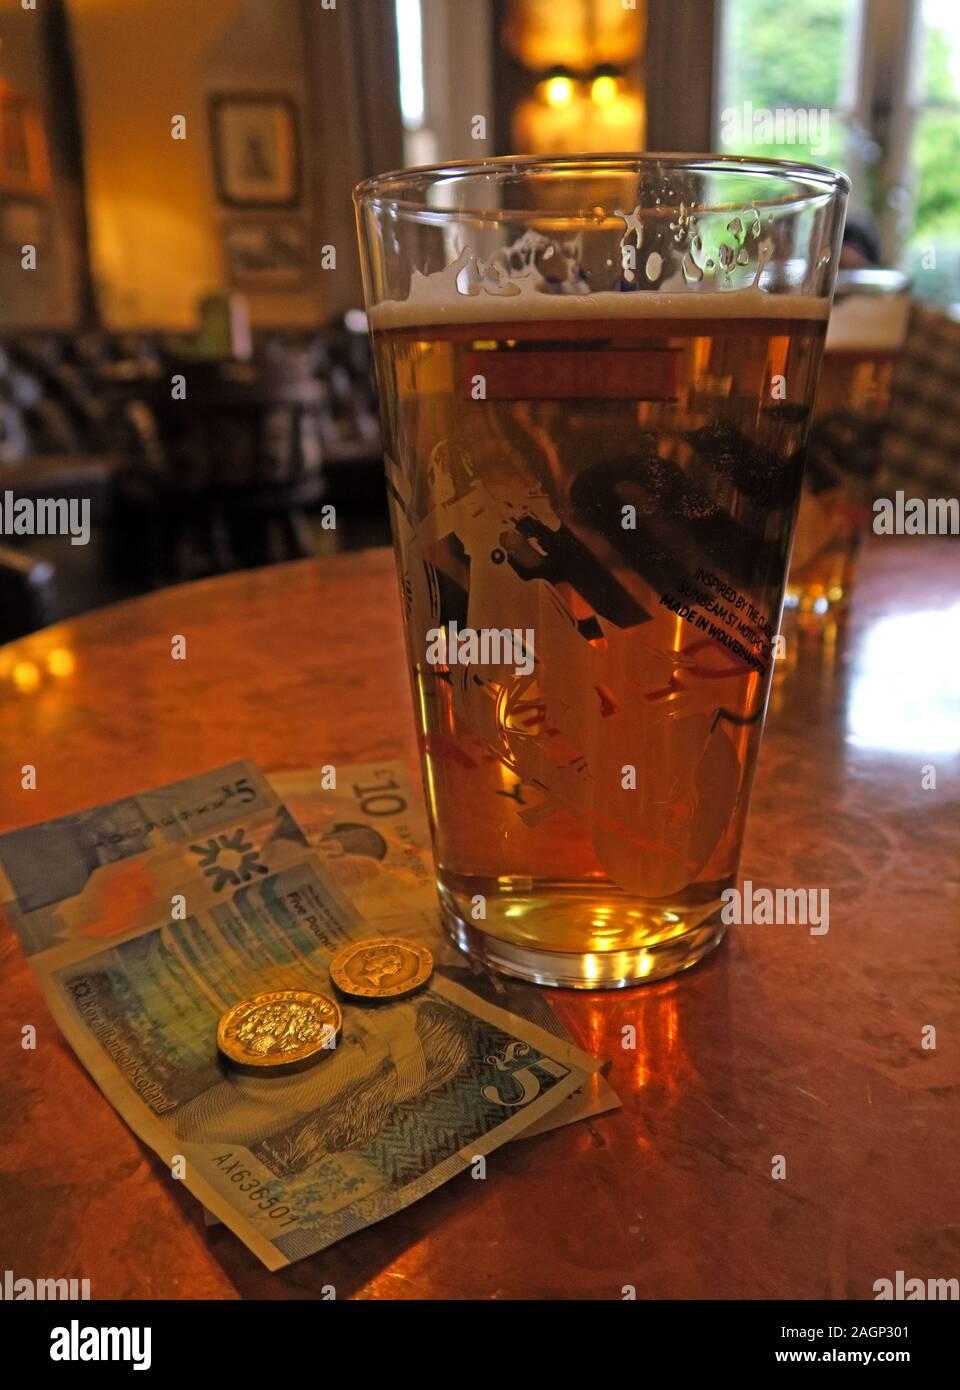 Dieses Stockfoto: Bier, UK Sterling Money, Schottland, Scottish Money, Schottische Noten - 2AGP30